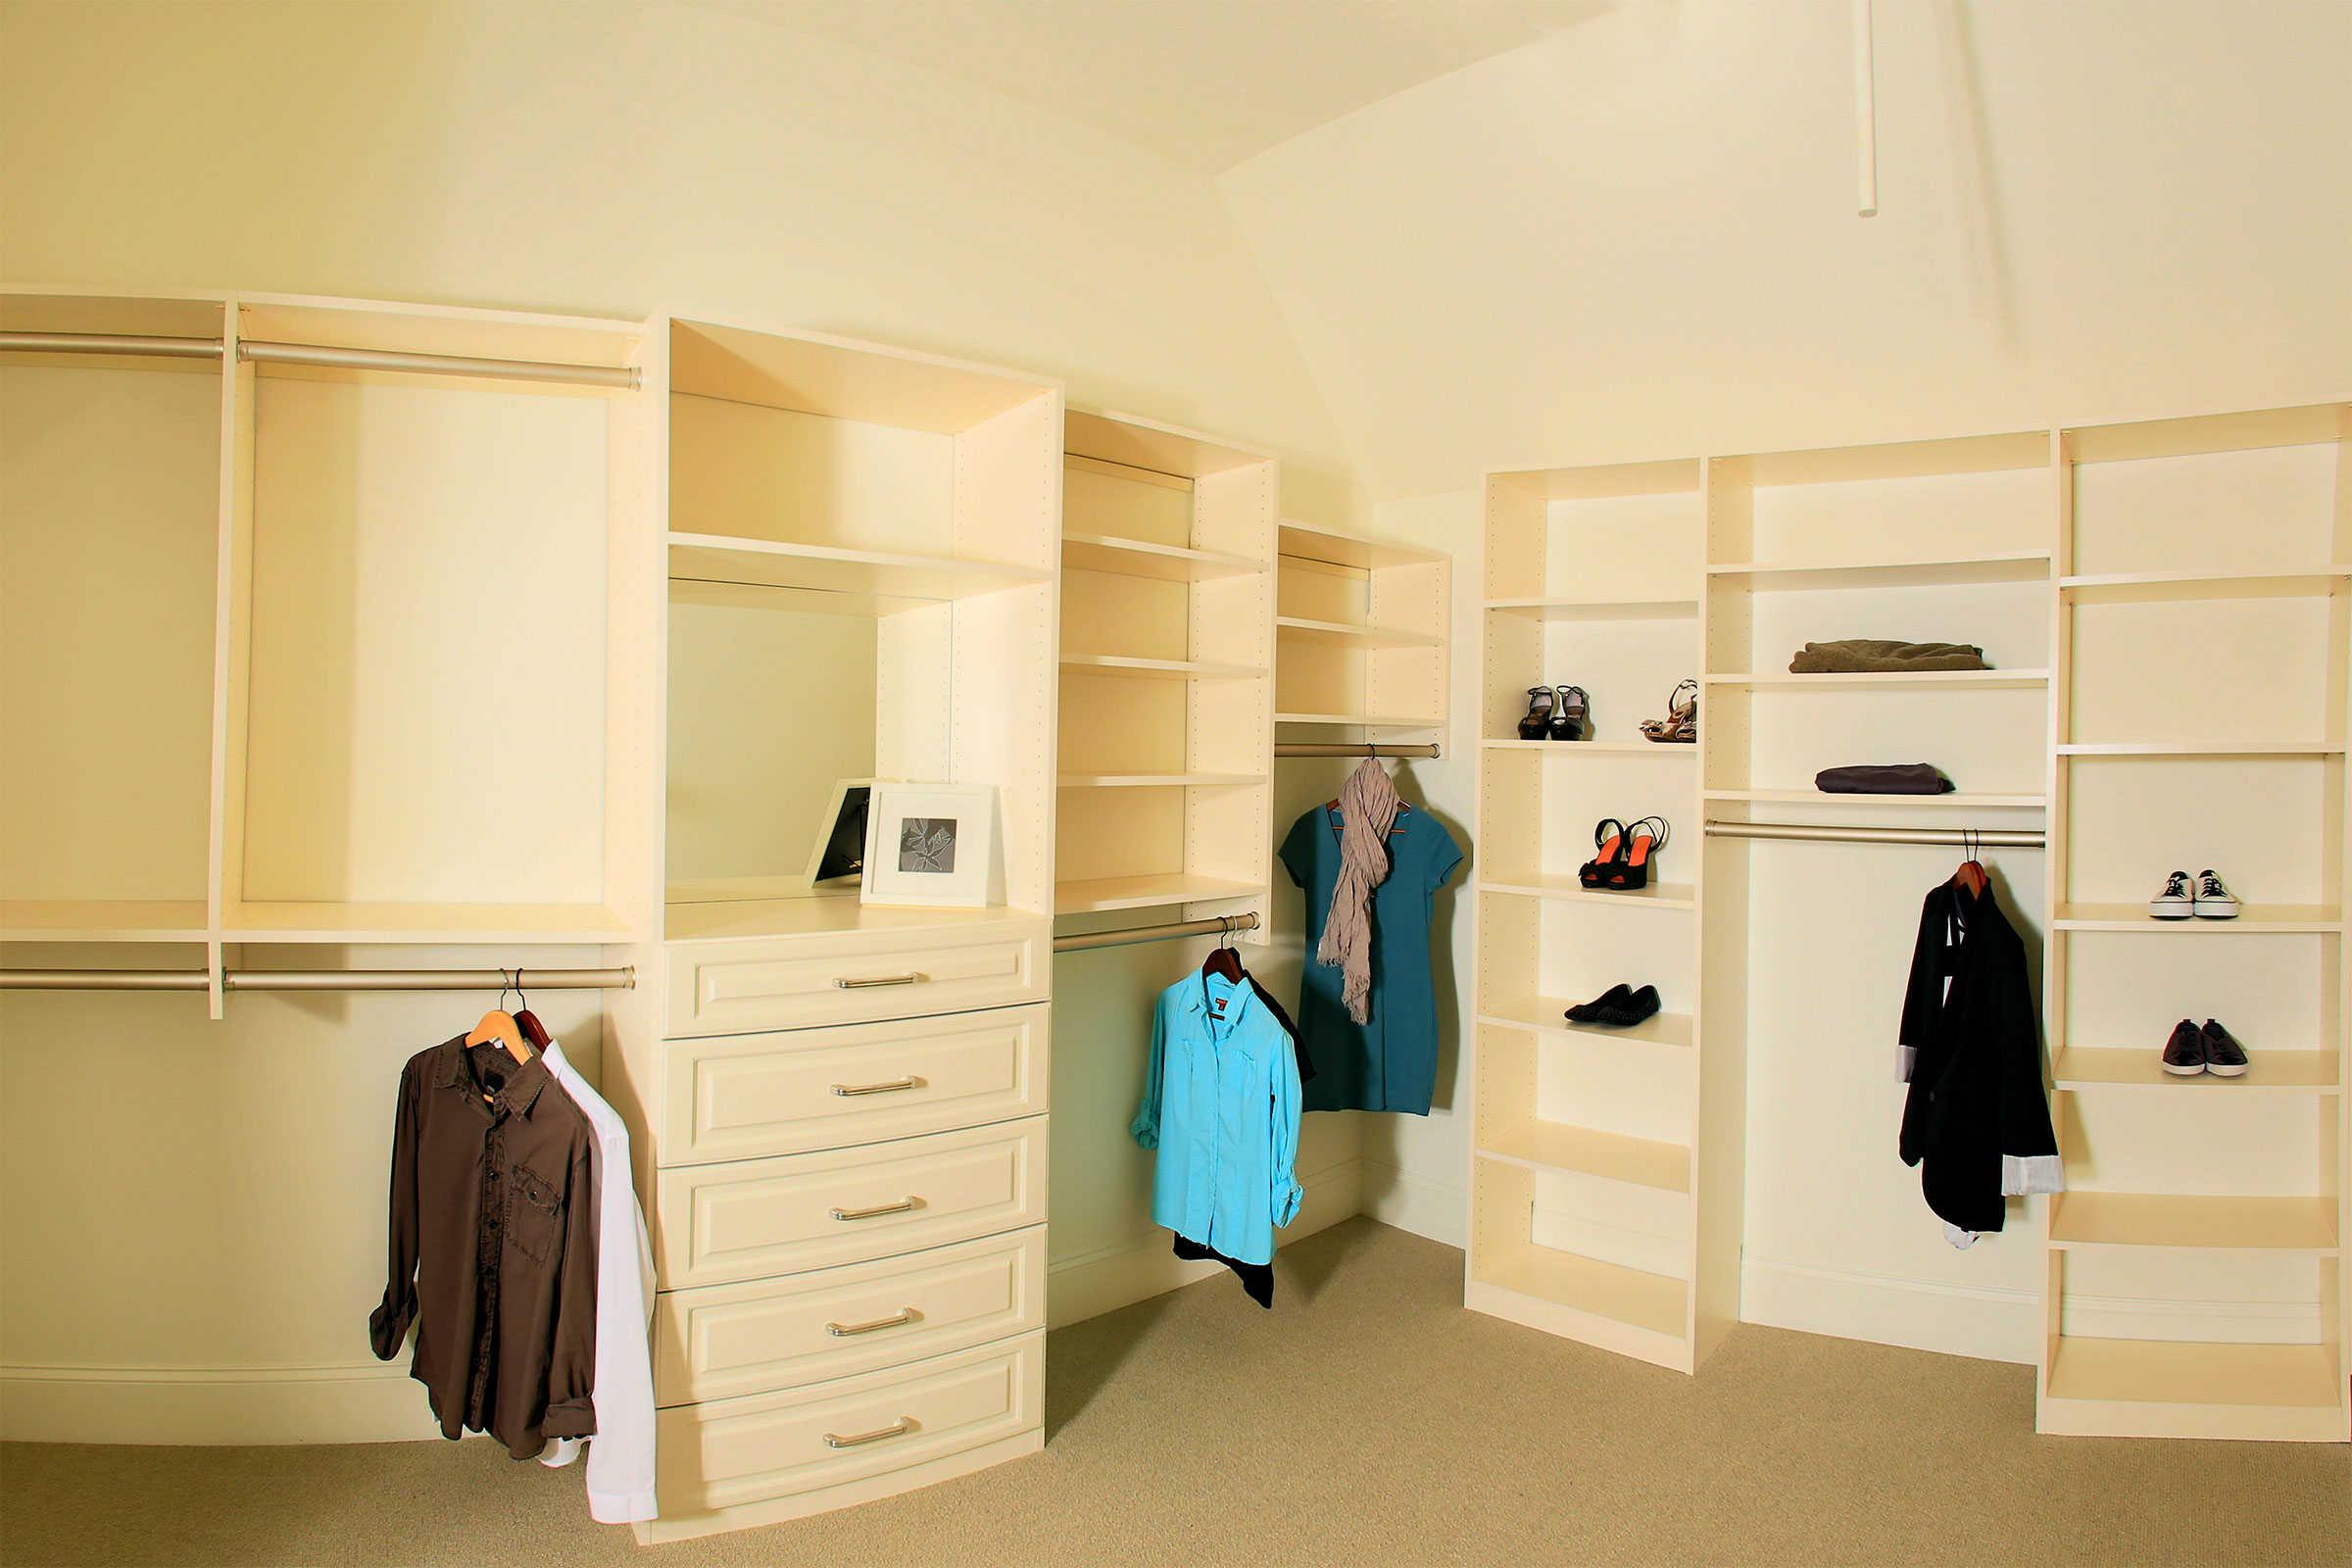 Uncategorized Diy Clothes Storage custom closets diy seasonal storage tips spacemakers closet with clothing storage